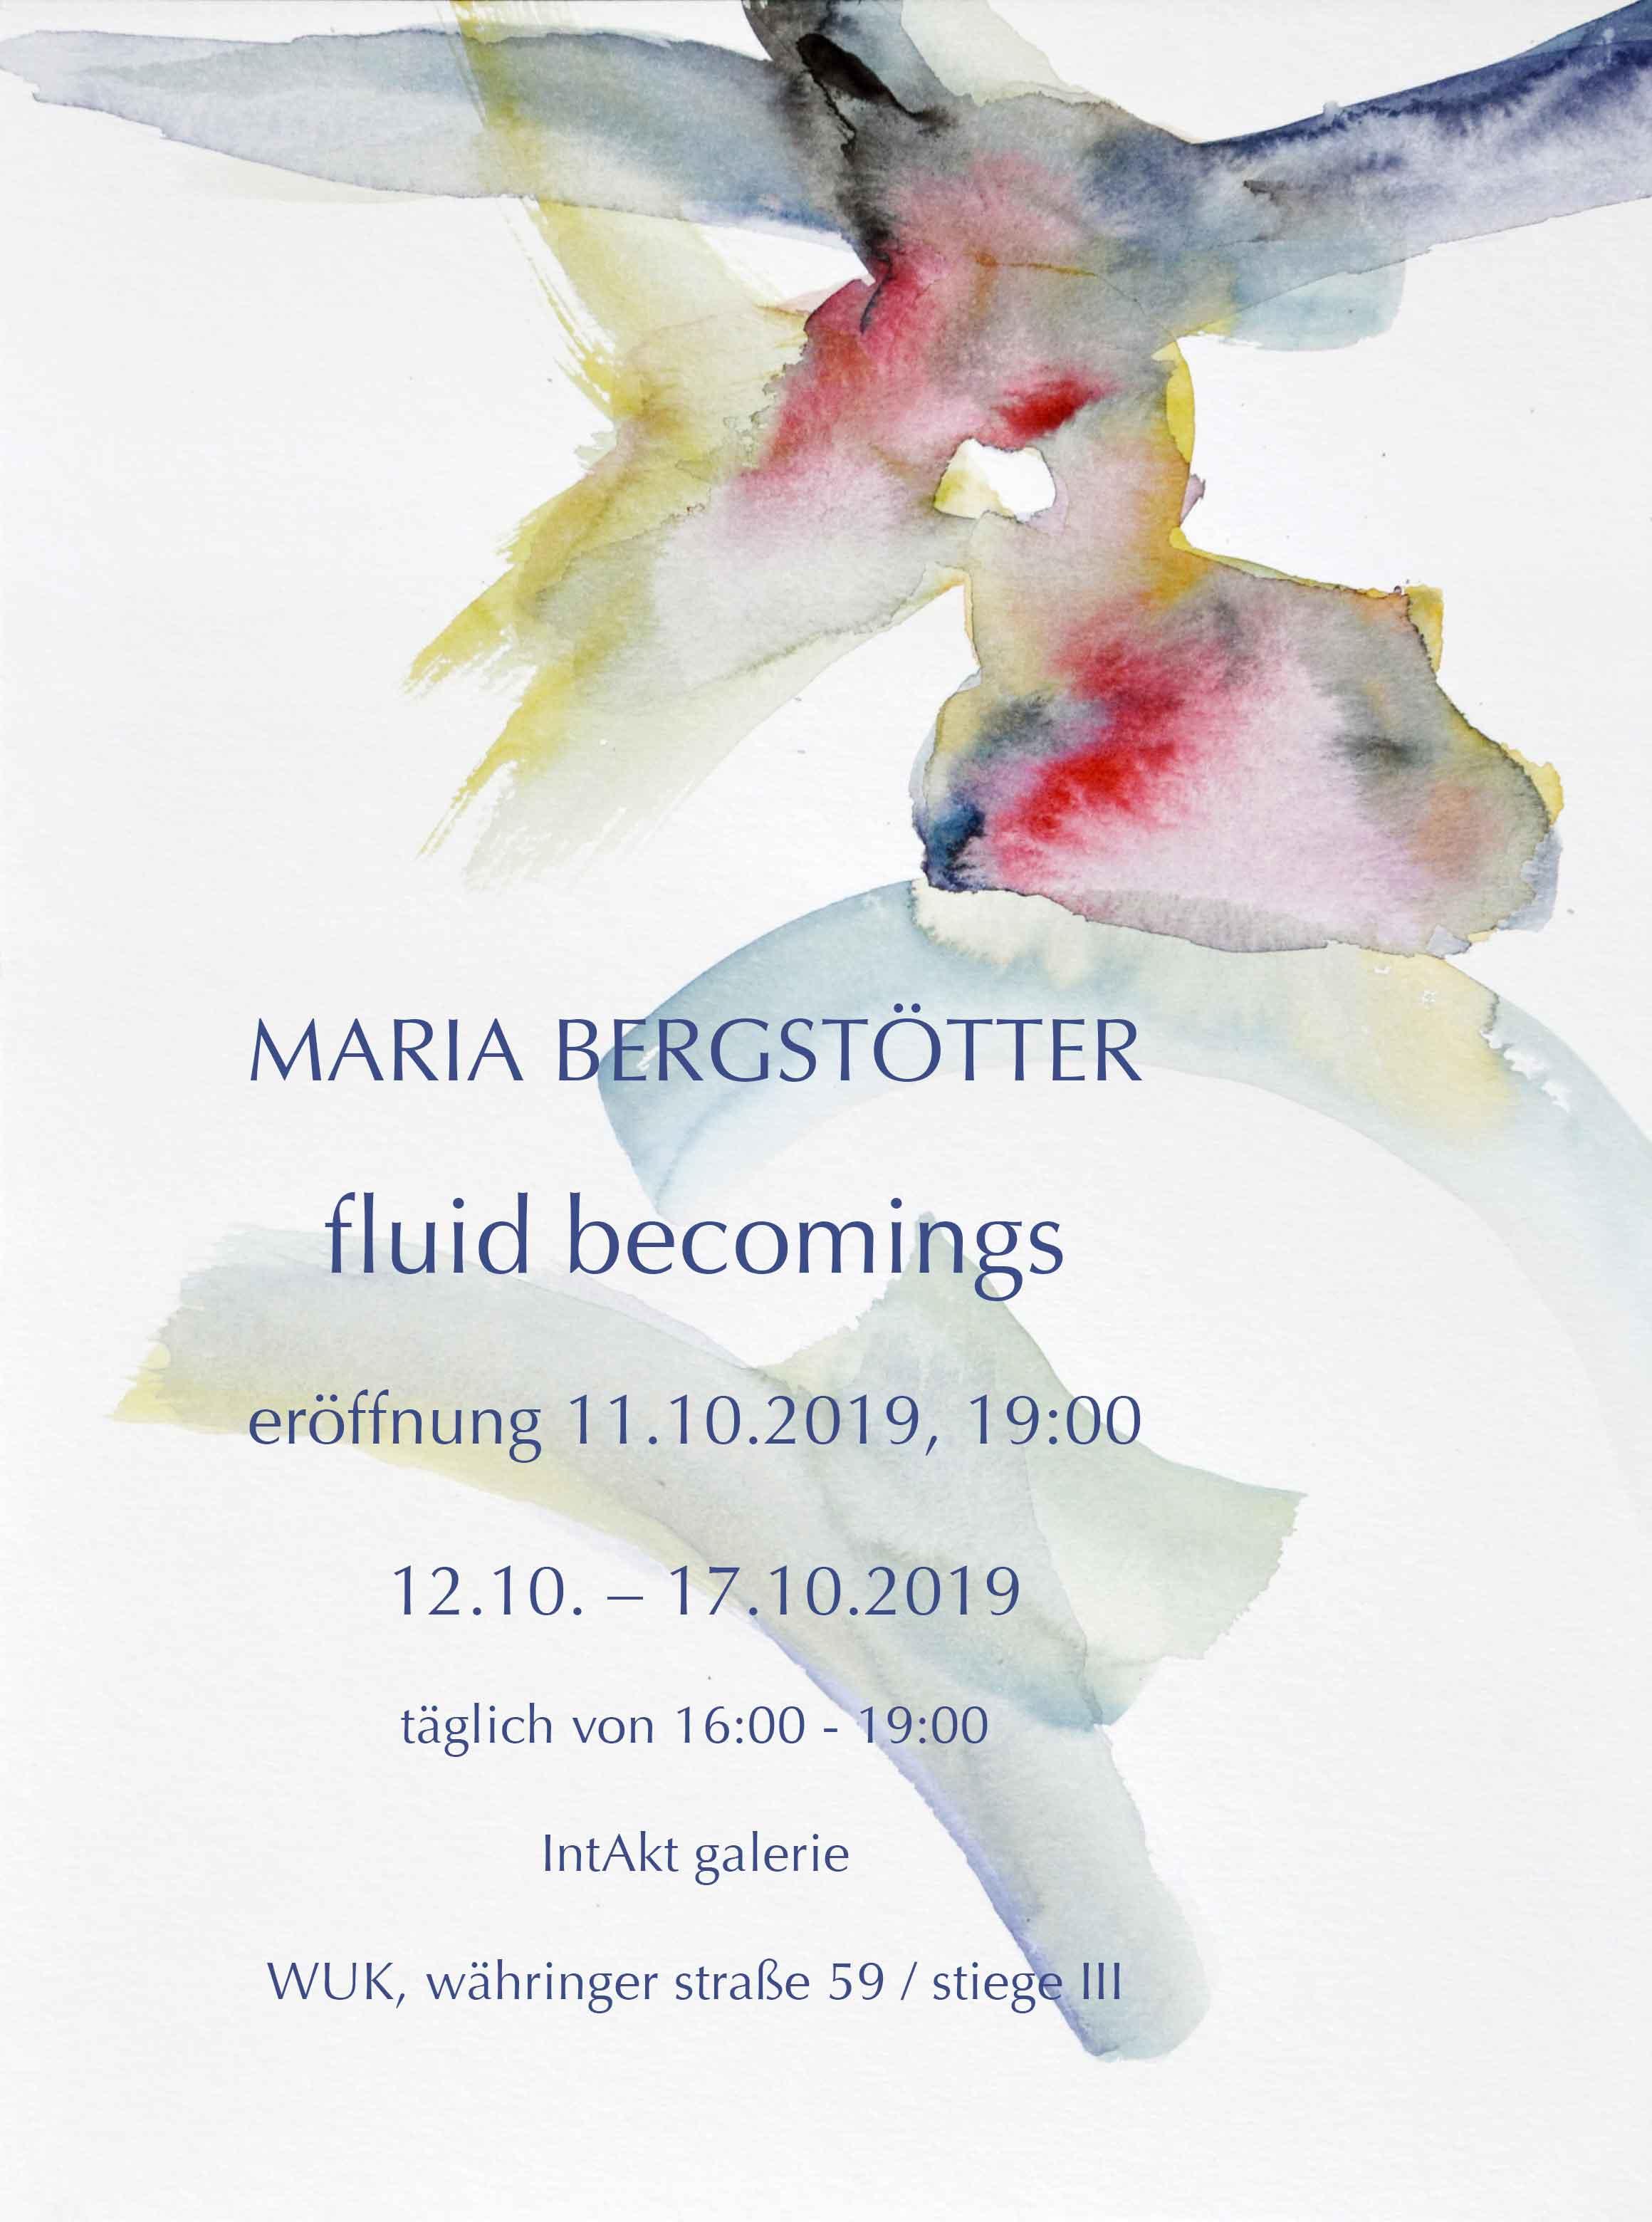 Maria Bergstötter – fluid becomings